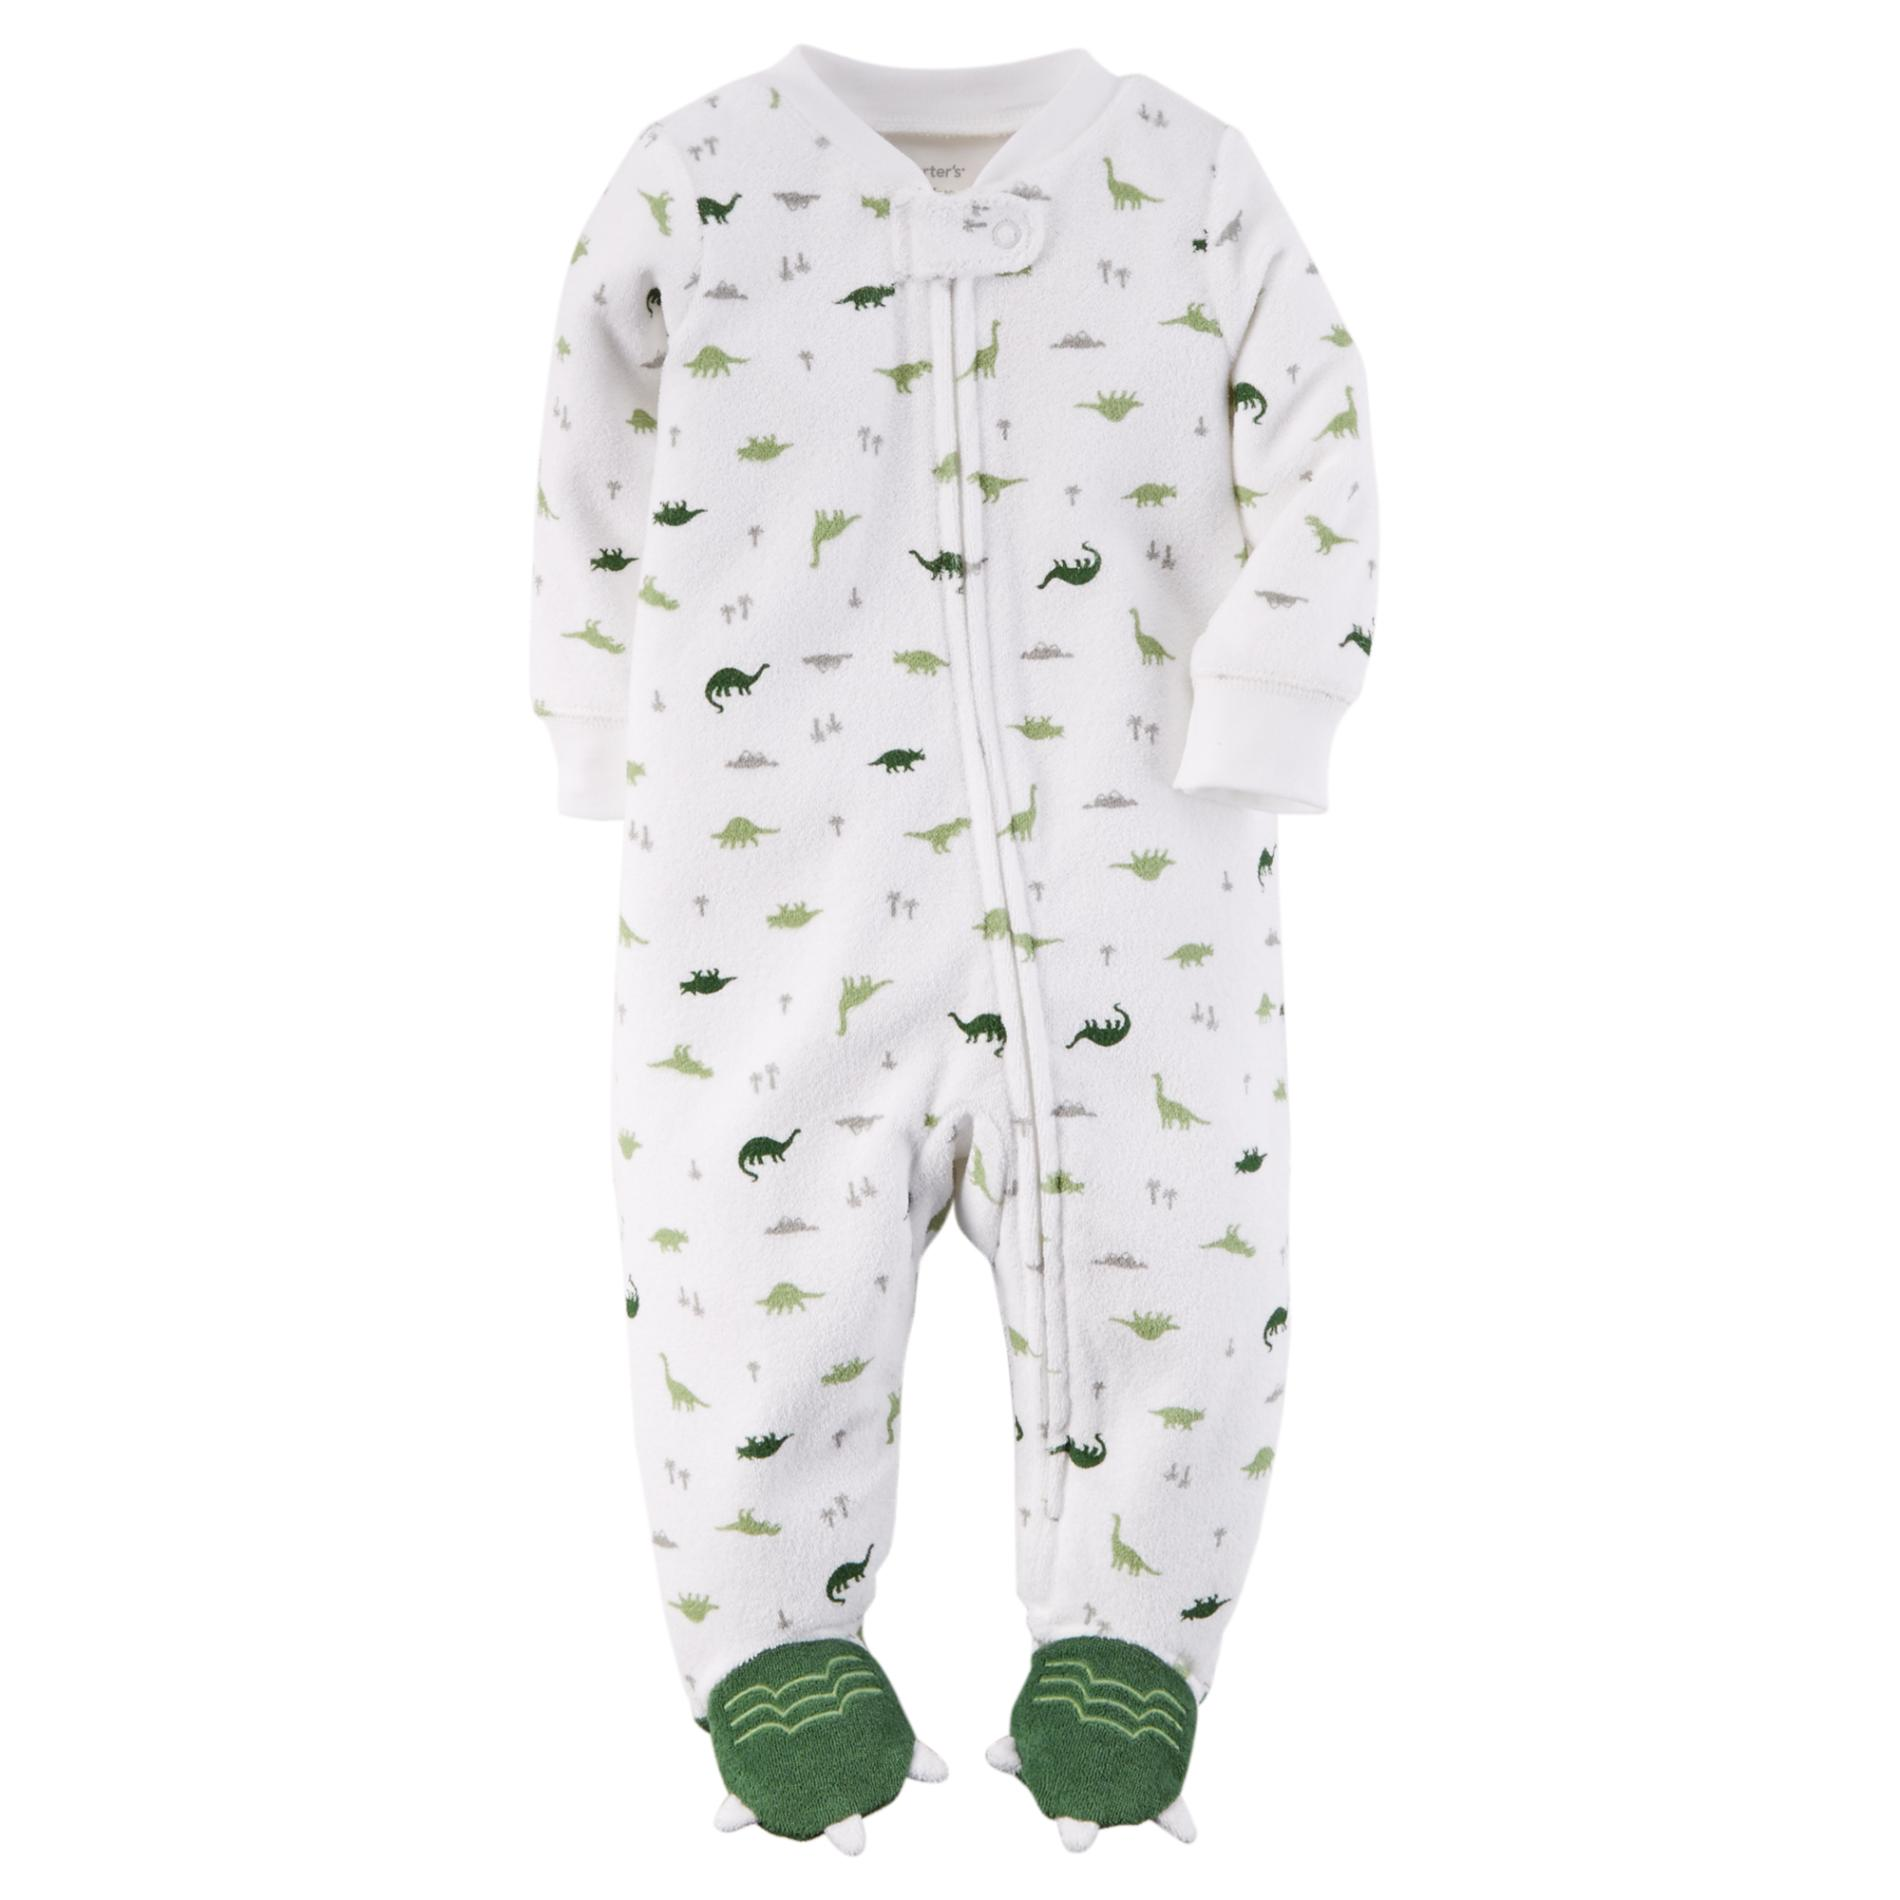 Carter's Newborn Boy's Terry Cloth Sleeper Pajamas - Dinosaur